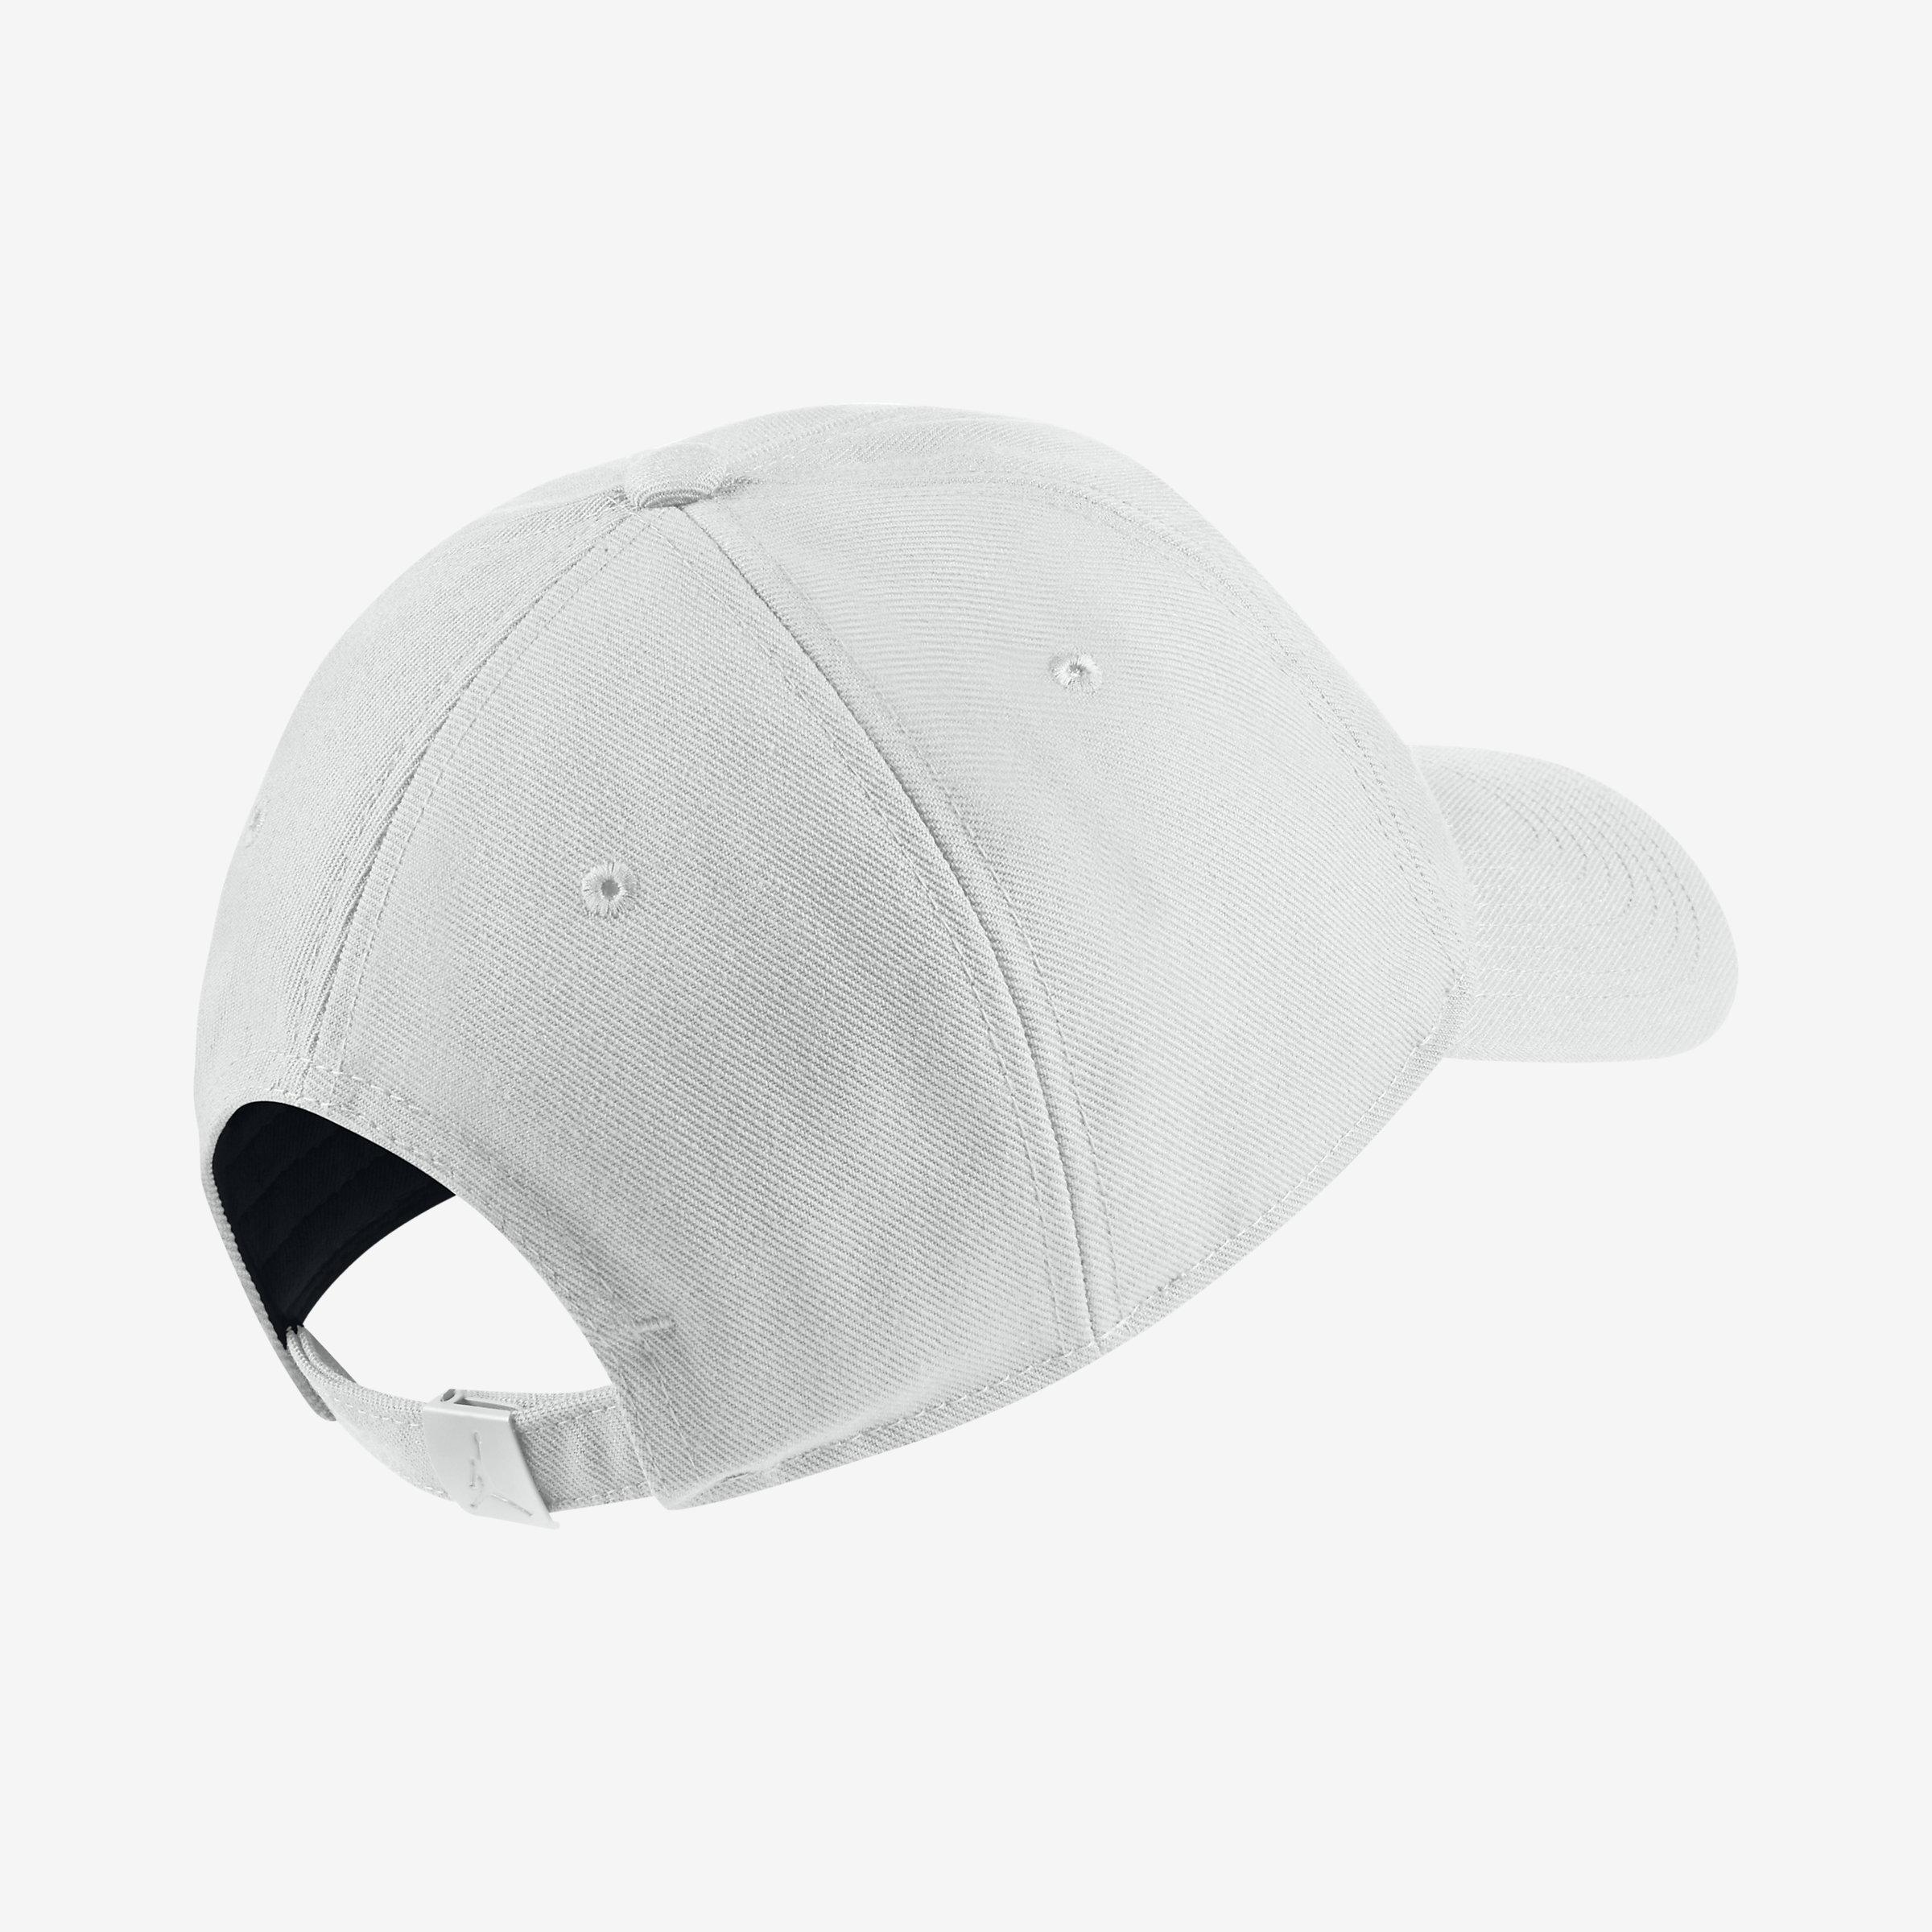 6d848d03a55ce6 Nike Jordan Jumpman H86 in White for Men - Lyst